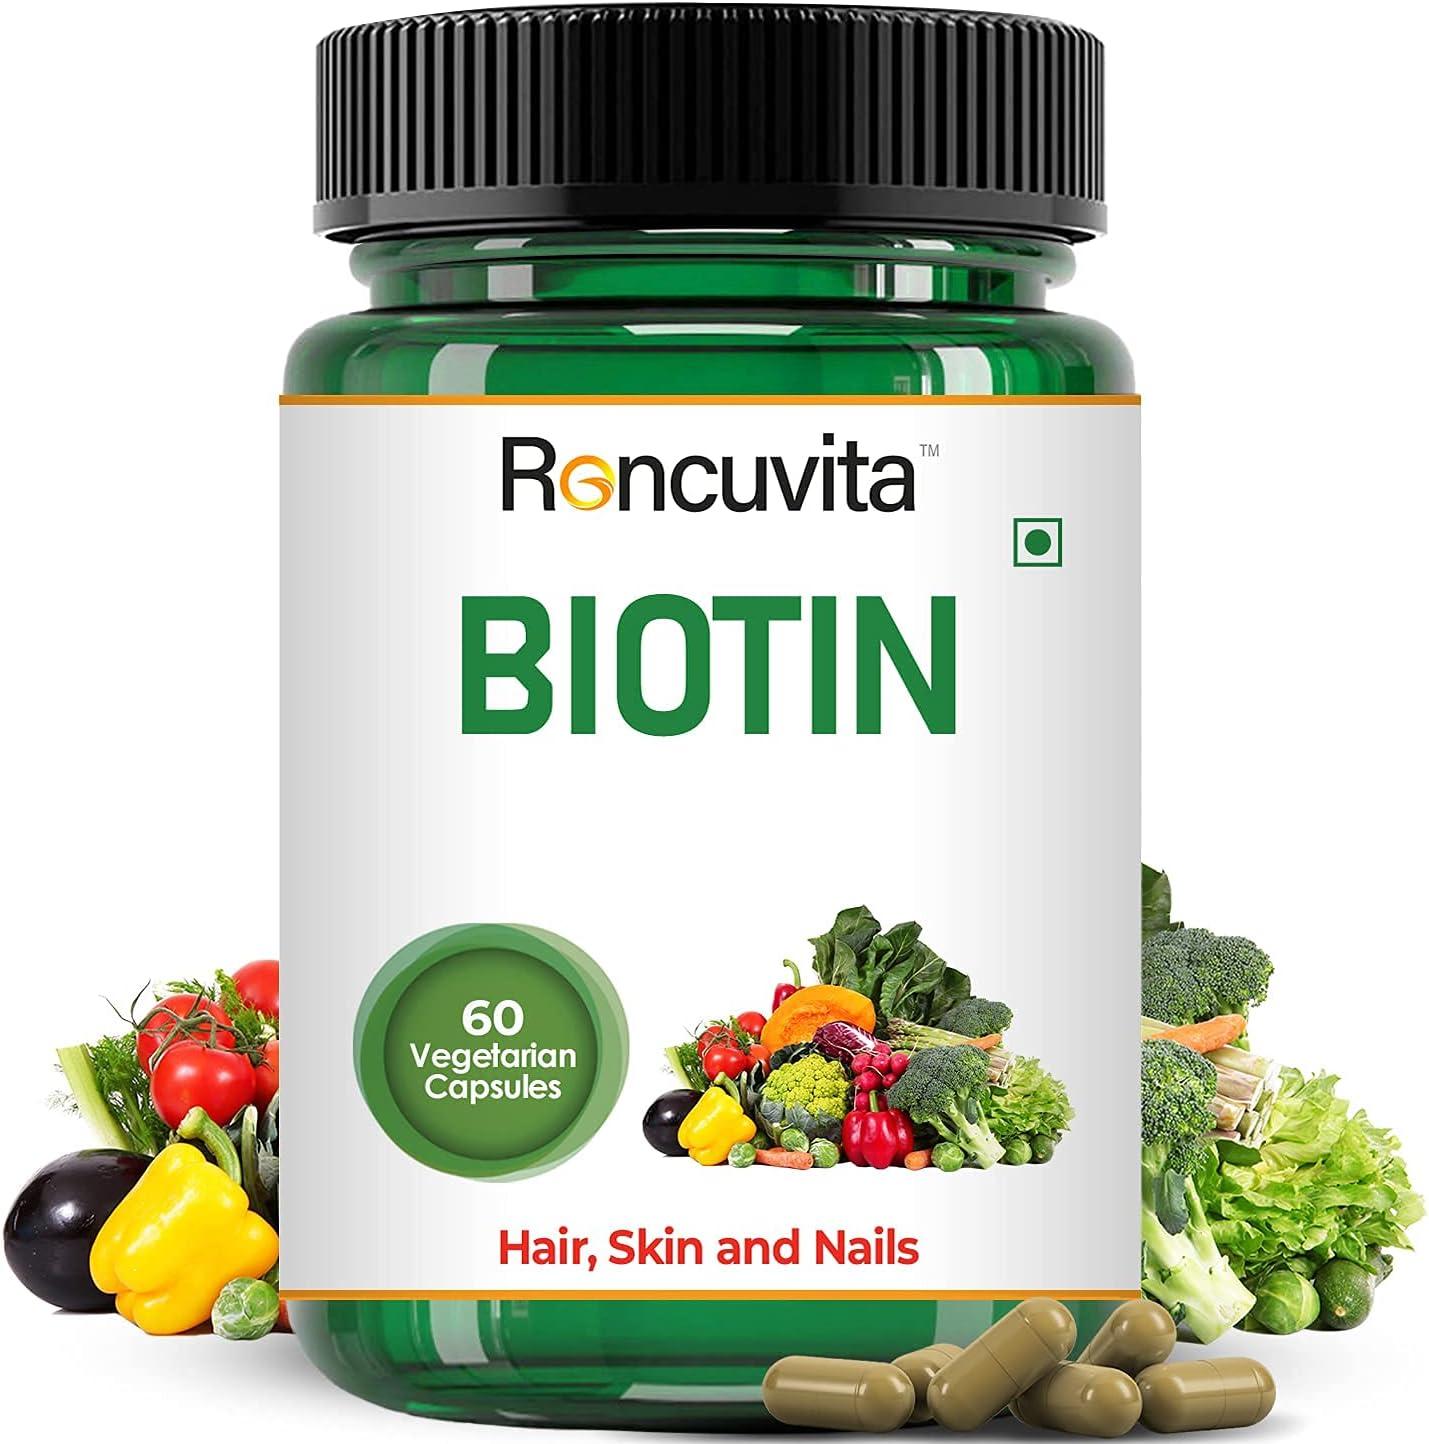 Astha Roncuvita Biotin Capsule Max 47% OFF Genuine for Healthy Nails Suppleme Skin